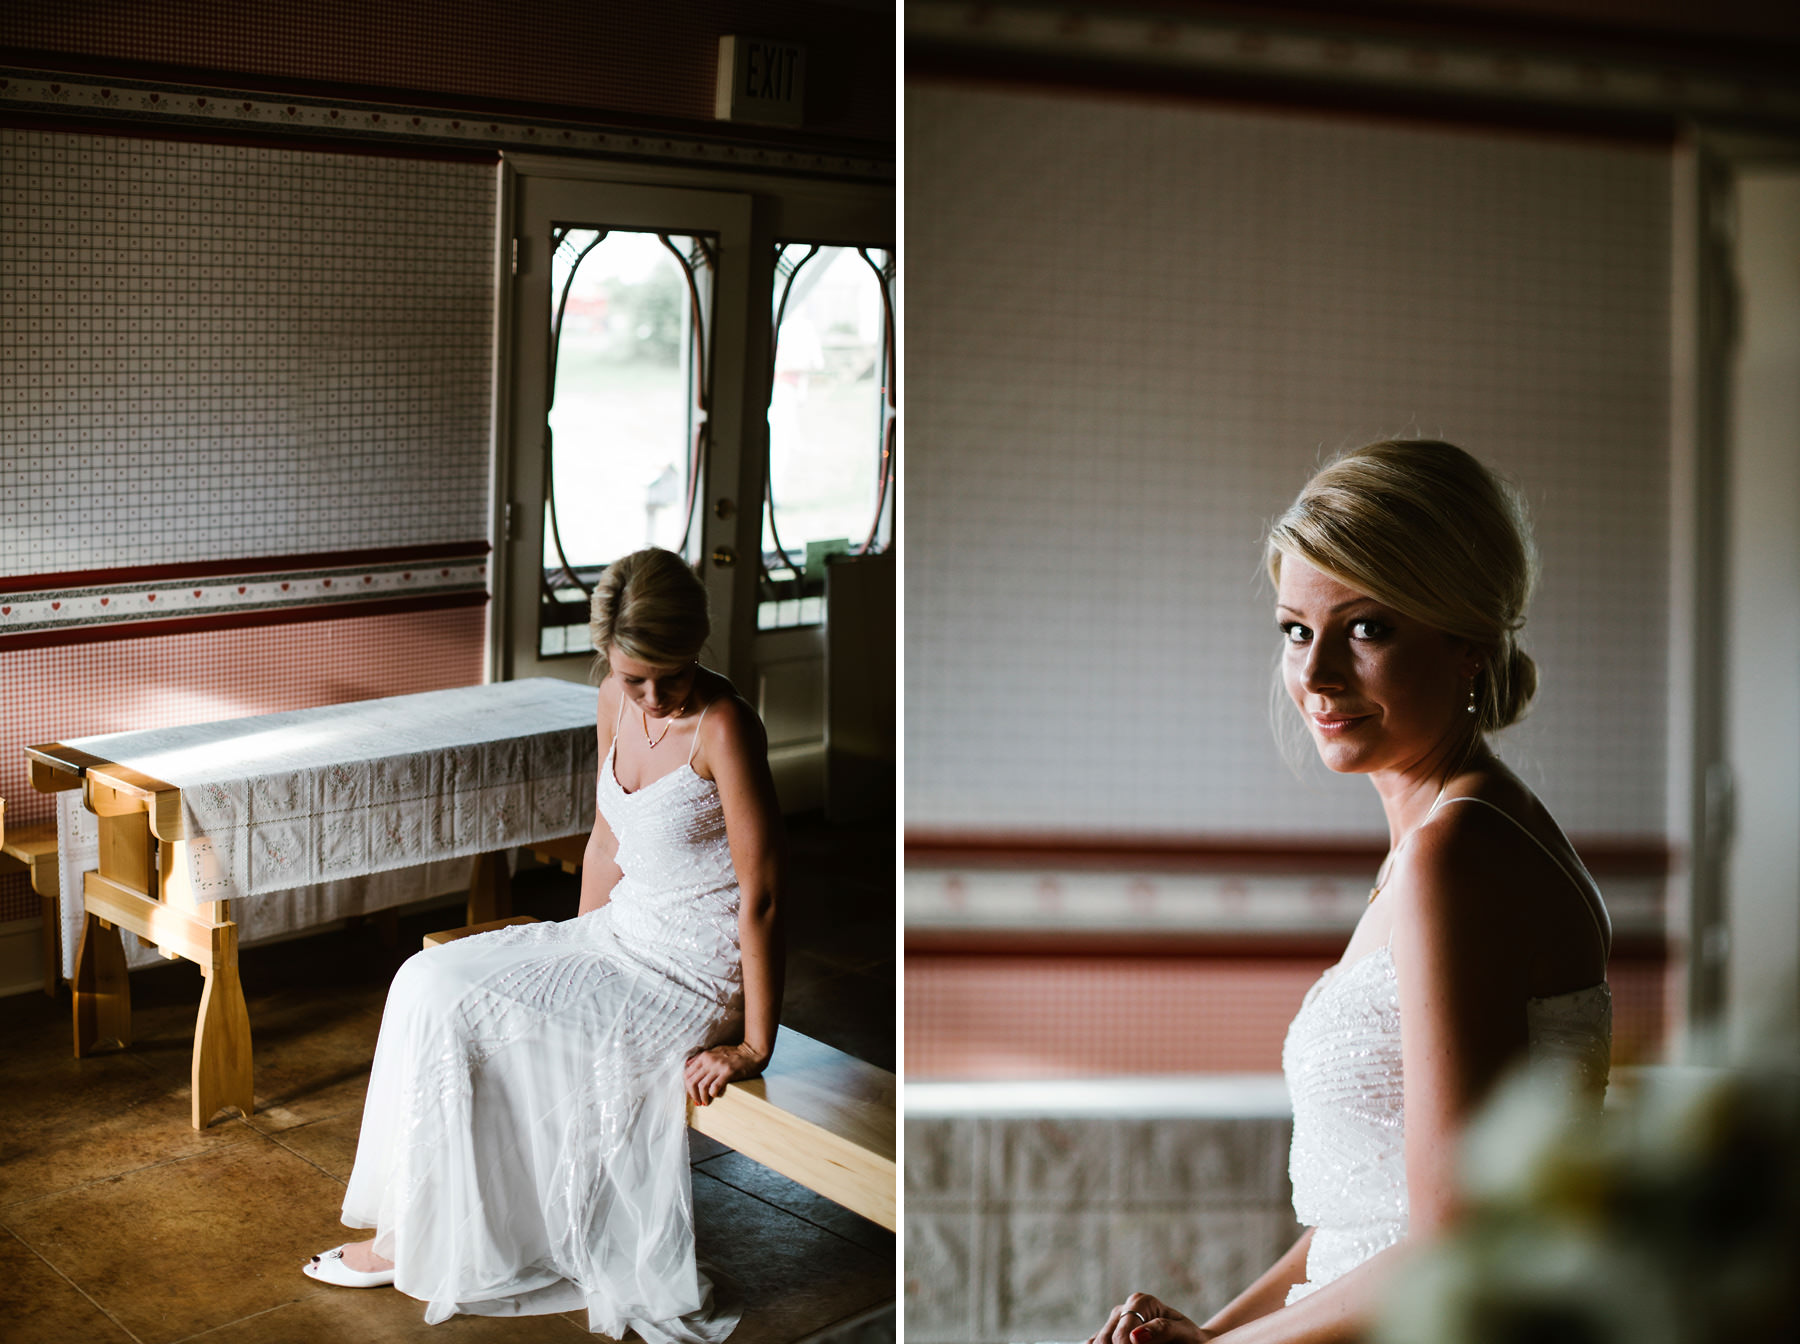 Alldredge Orchard Kansas City_Kindling Wedding Photography BLOG 27.JPG